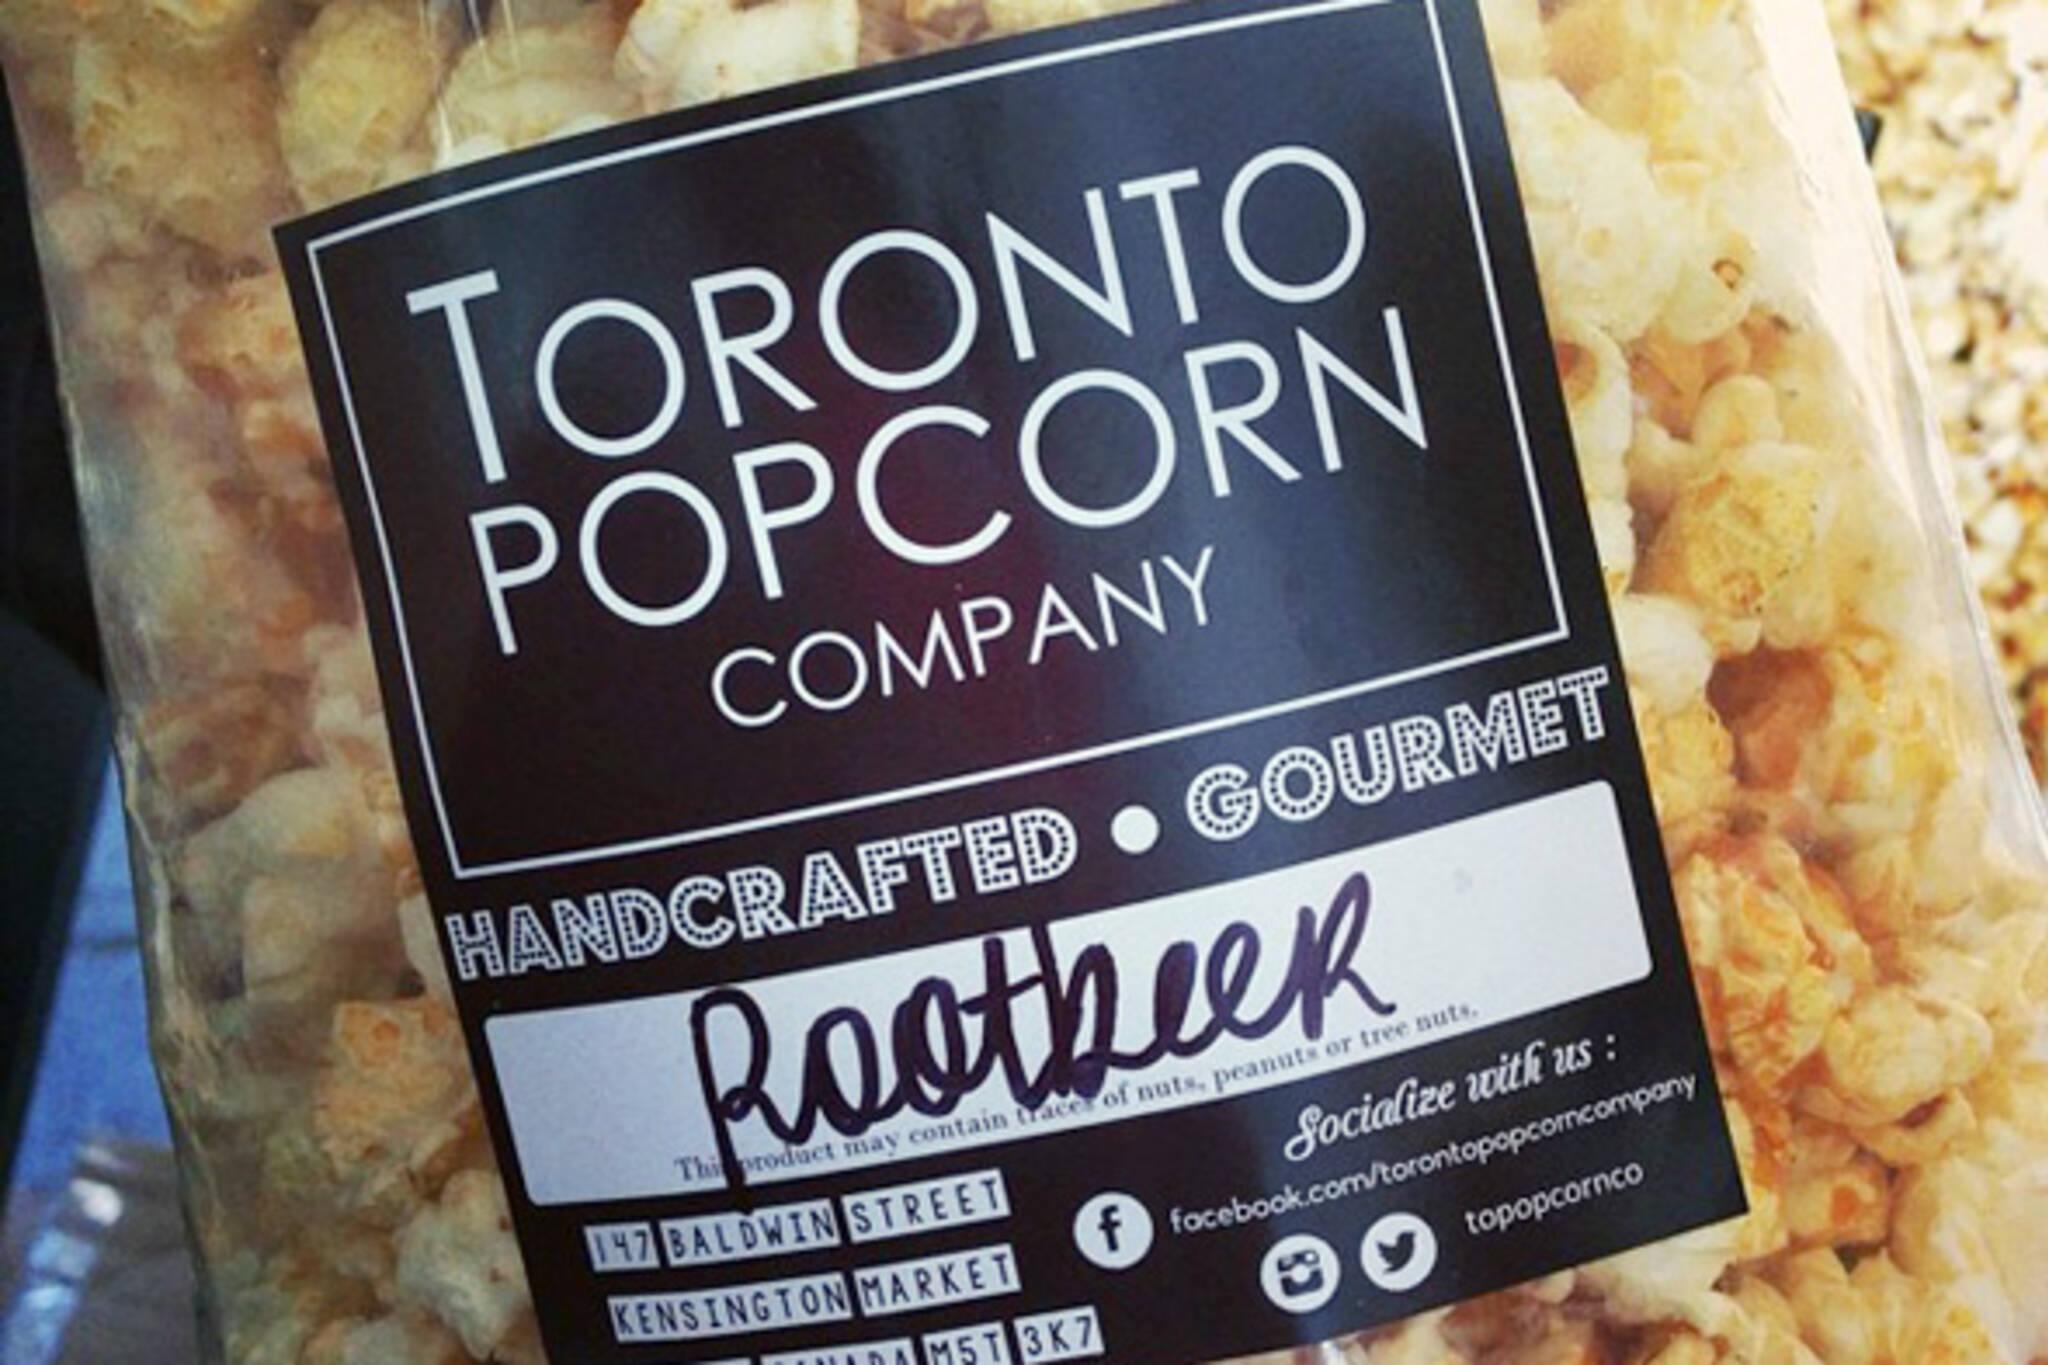 toronto popcorn